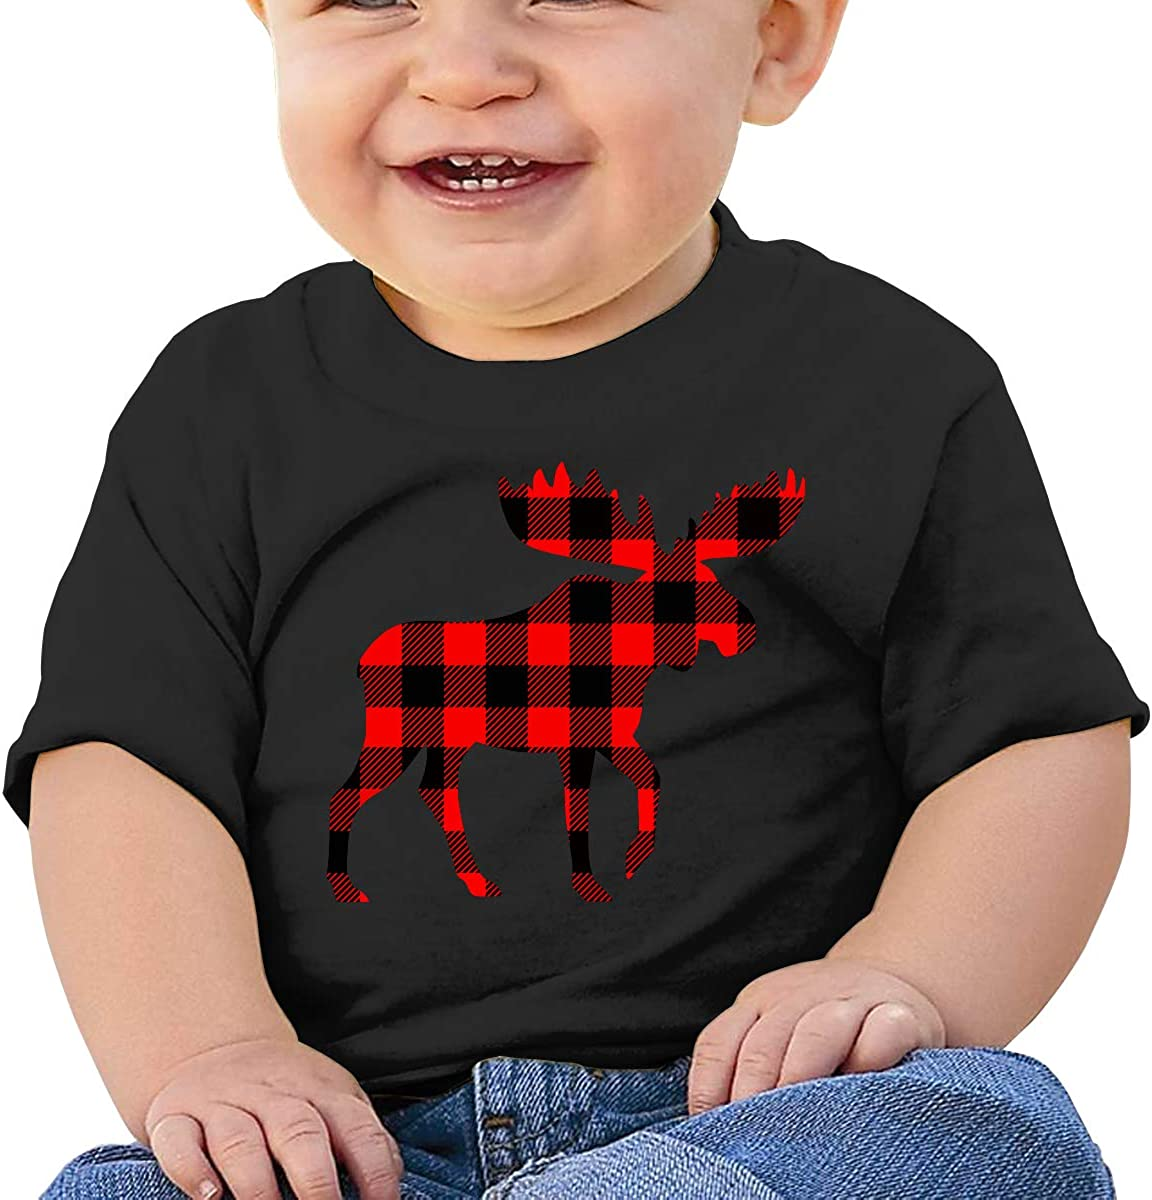 Red Buffalo Plaid Moose Newborn Baby Short Sleeve Crew Neck T Shirts 6-18 Month Tops